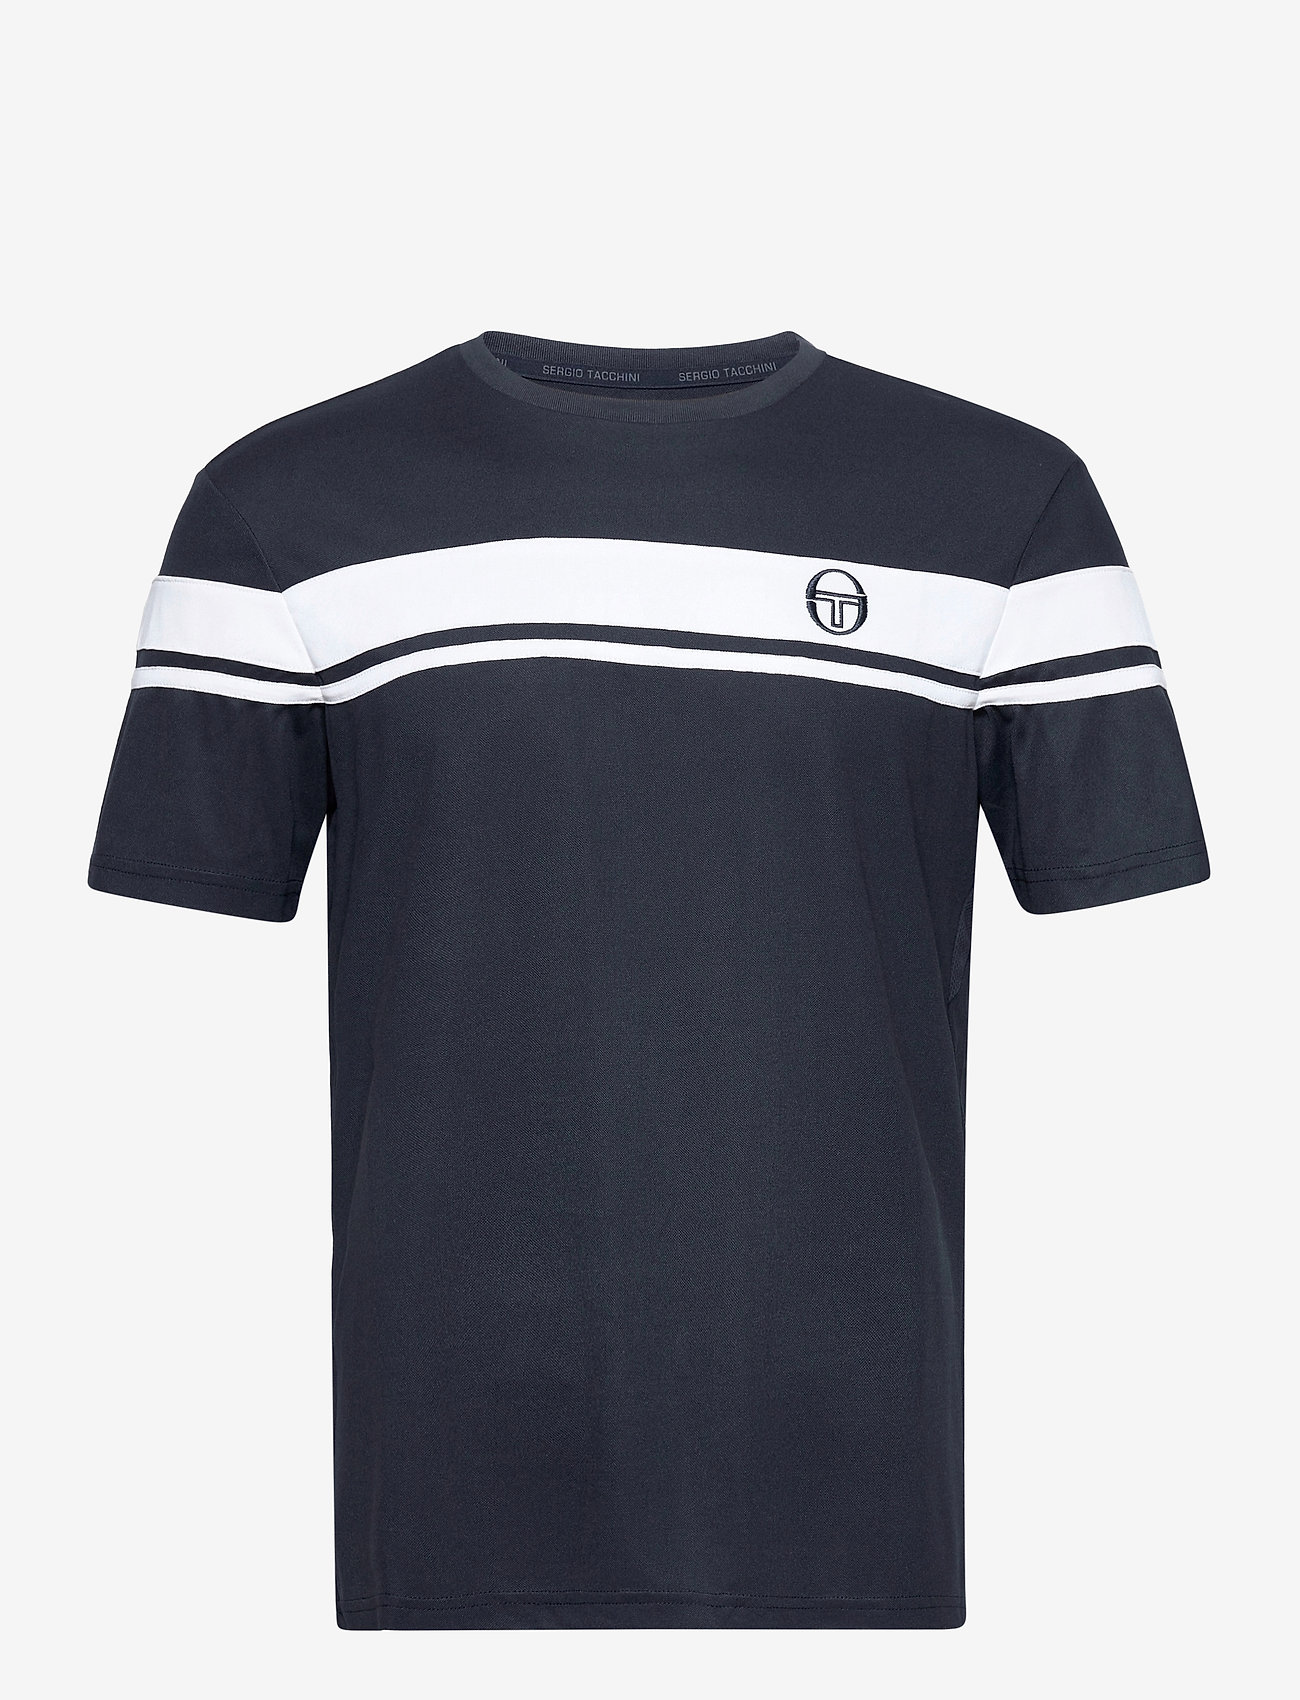 Sergio Tacchini - YOUNG LINE PRO T-SHIRT - t-shirts - navy/white - 0